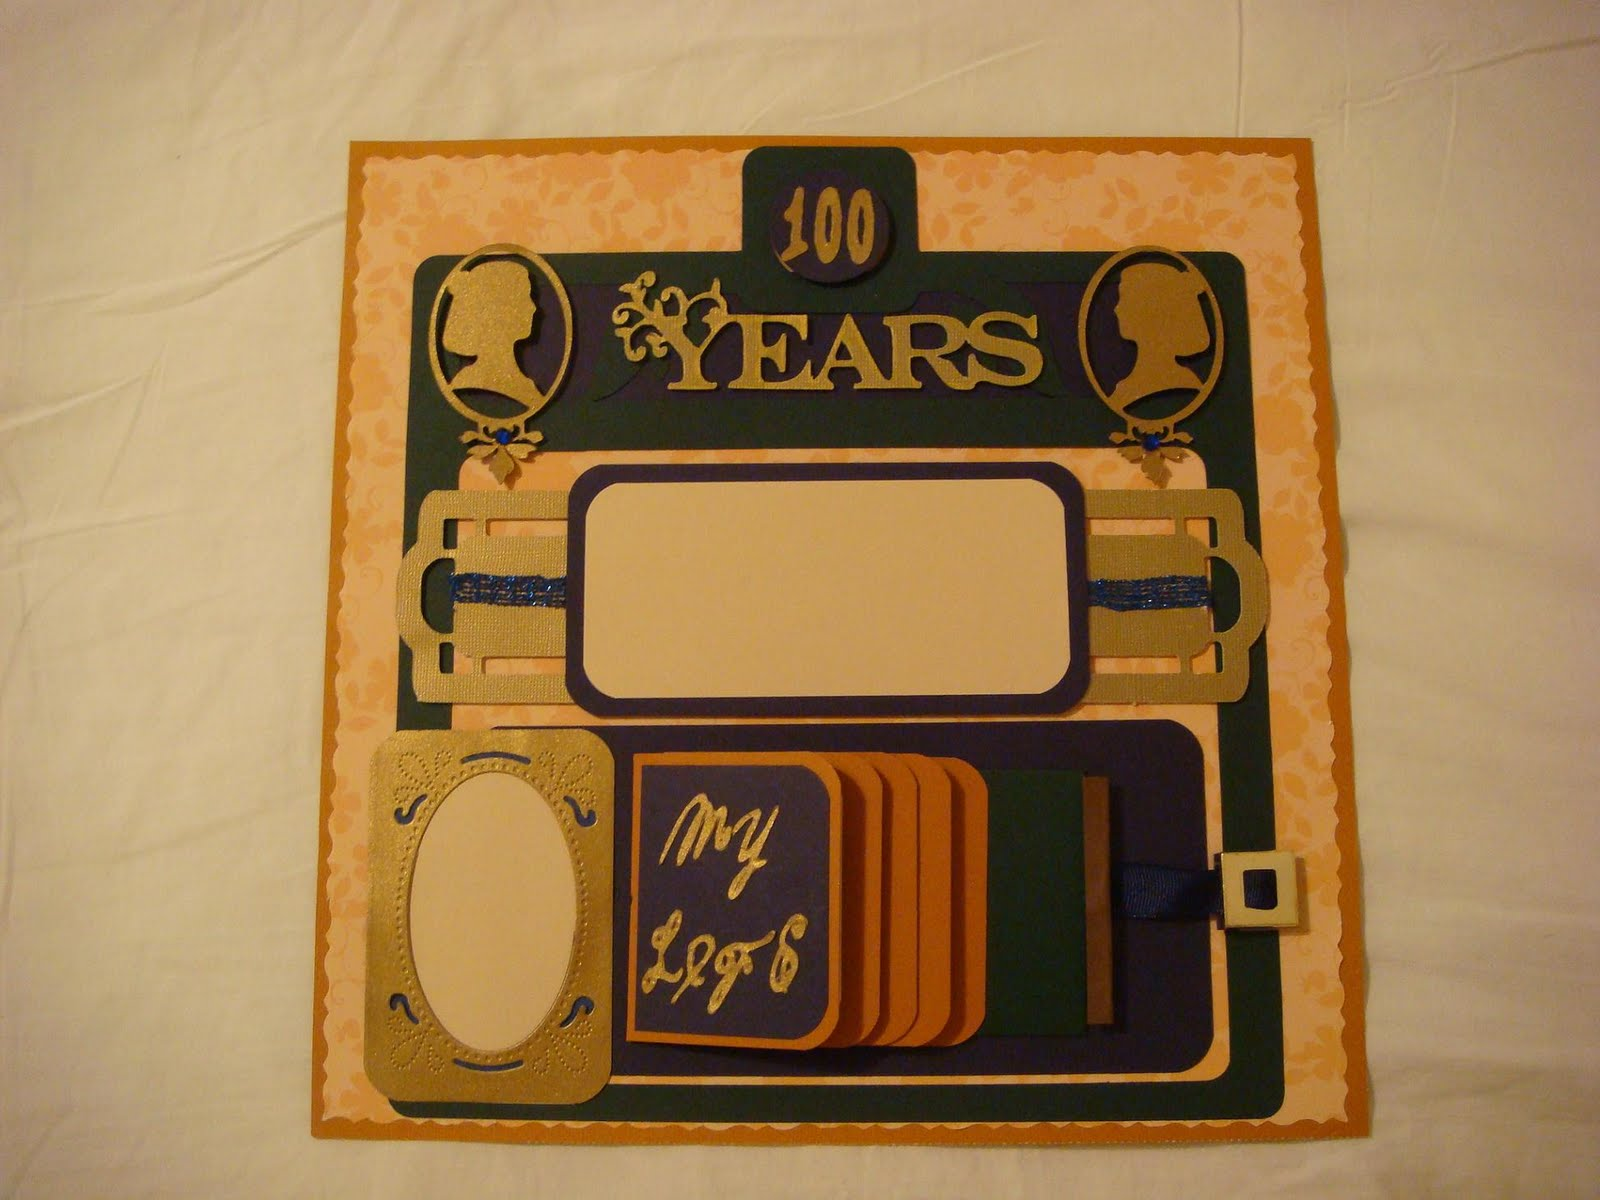 Scrapbook ideas using cricut - Three Birthday Layouts Using The Cricut Expression